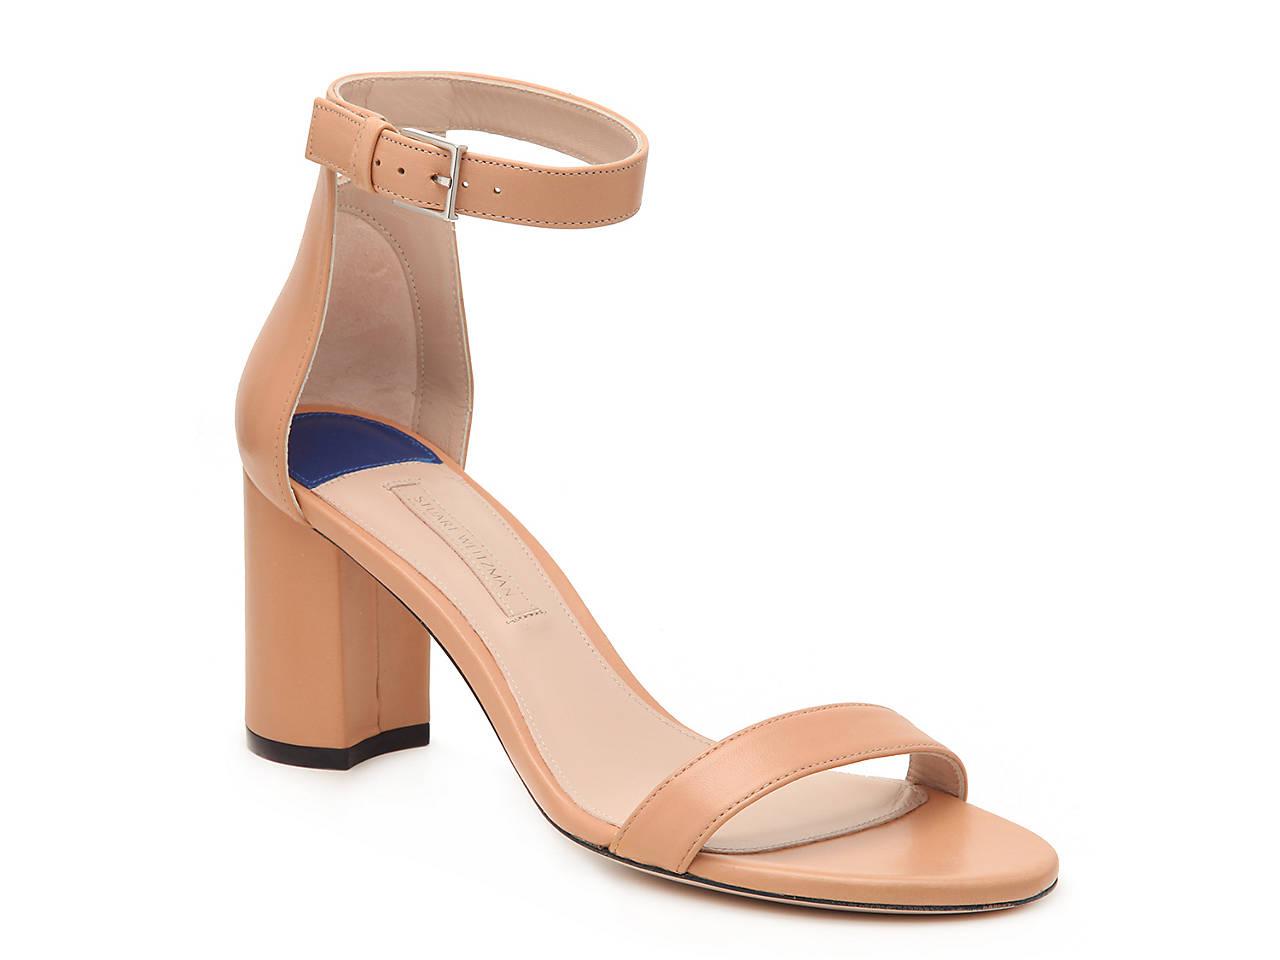 eb09f514640 Stuart Weitzman Lessnu Sandal Women s Shoes